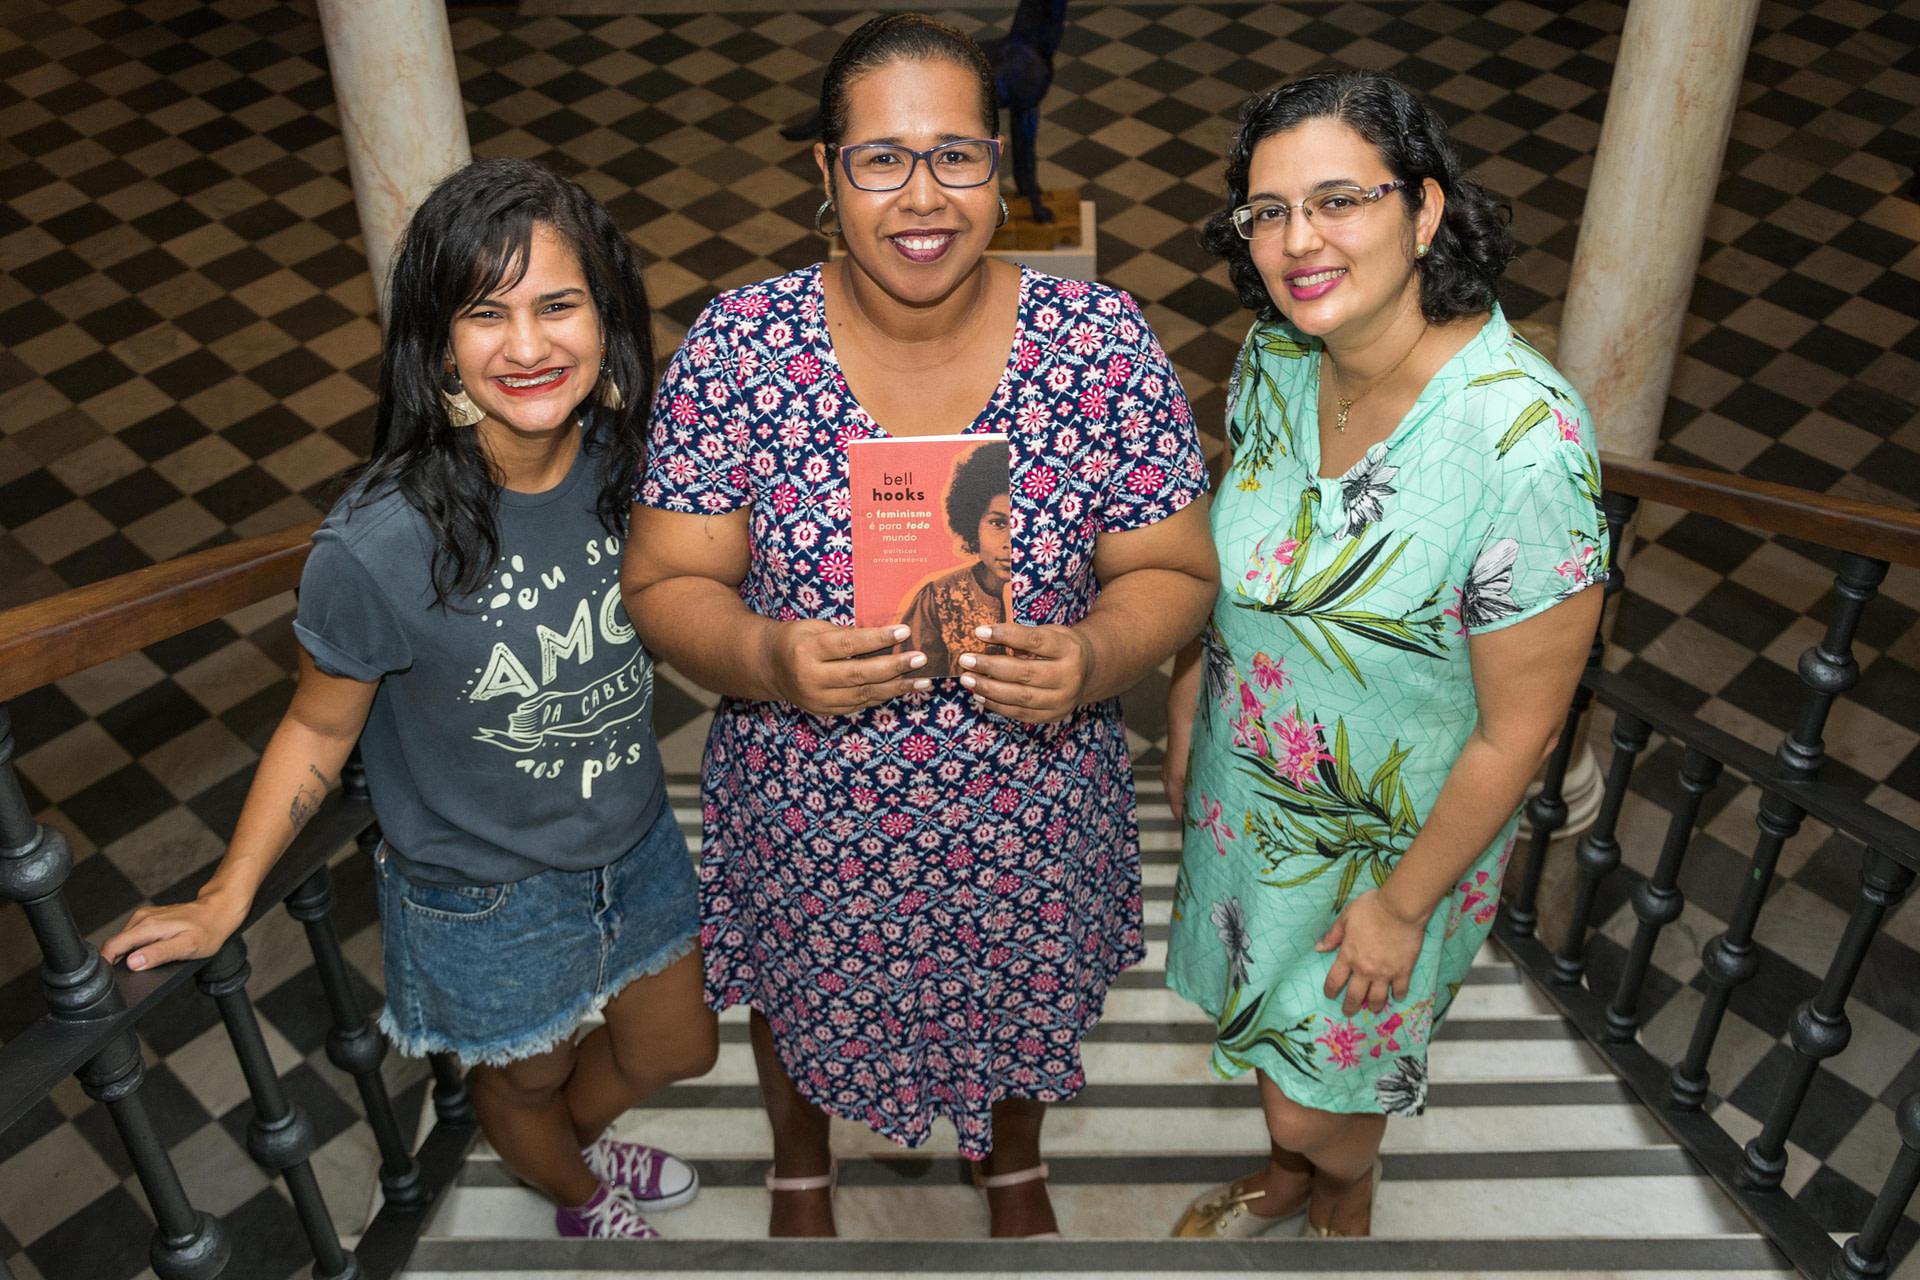 Joana, Ilmara e Glaucia, mediadoras do Leia Mulheres